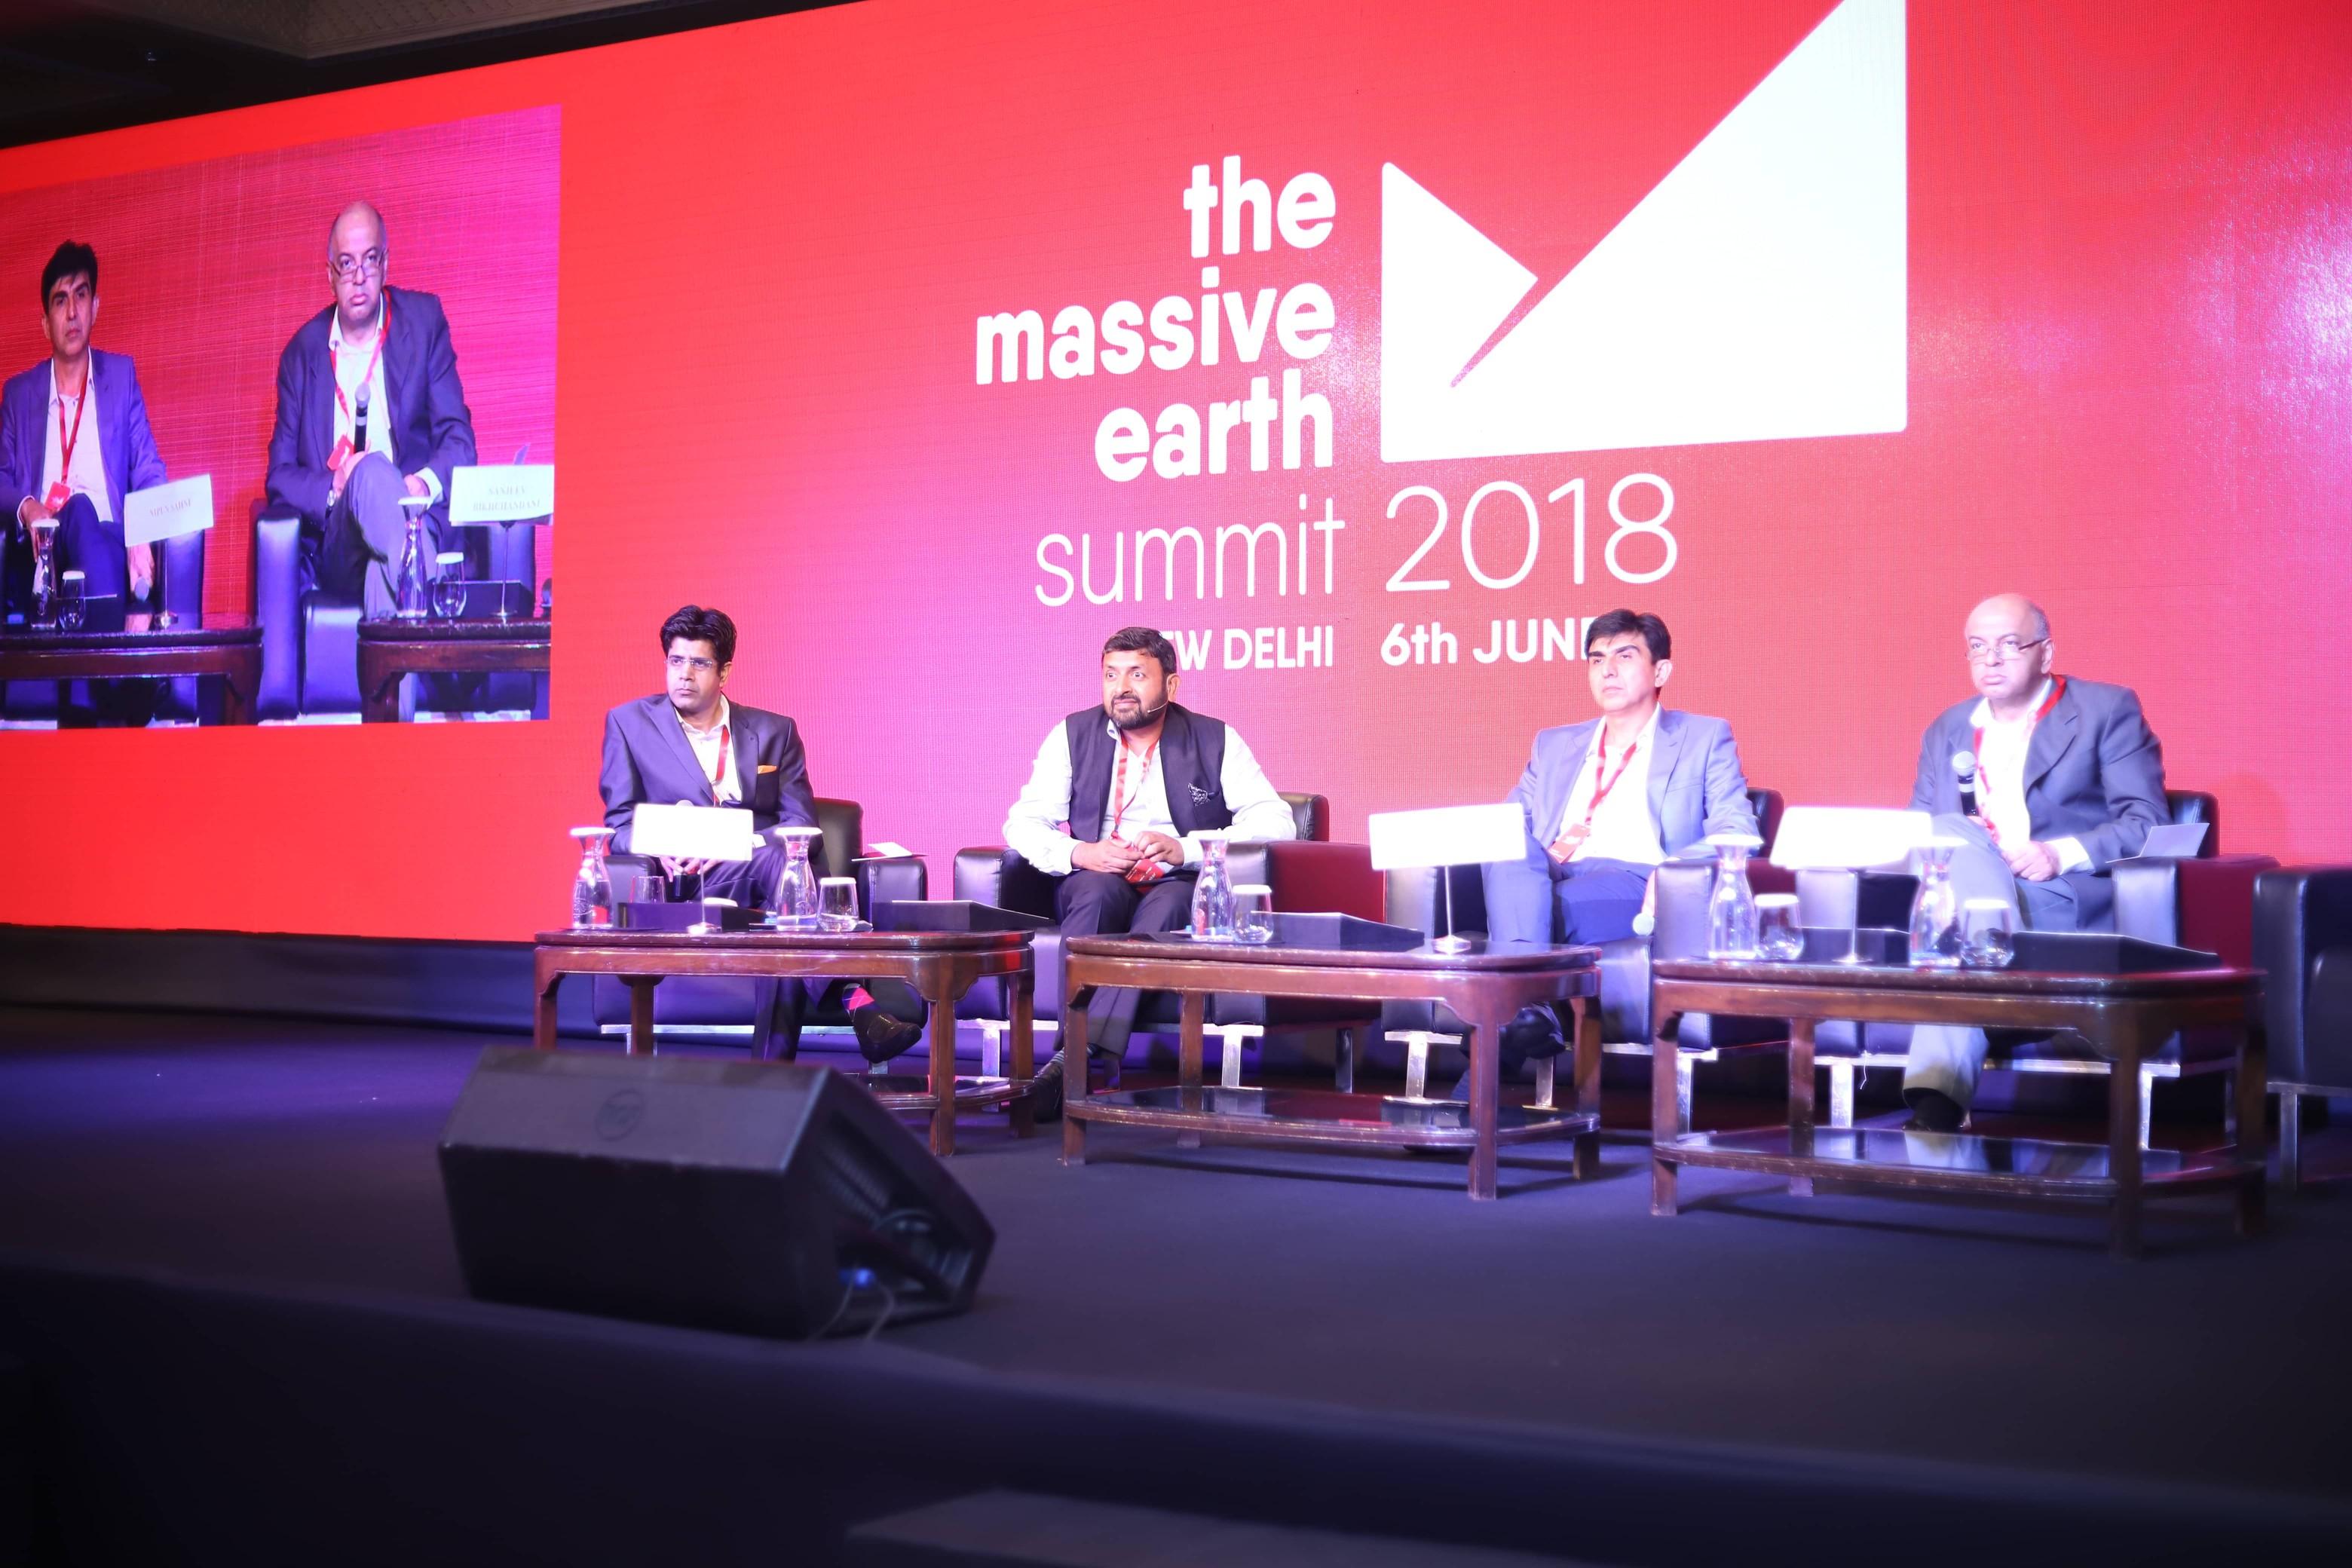 Shailesh Vickram Singh with Animesh Srivastava, Nipun Sahni and Sanjeev Bikhchandani at Massive Earth Summit